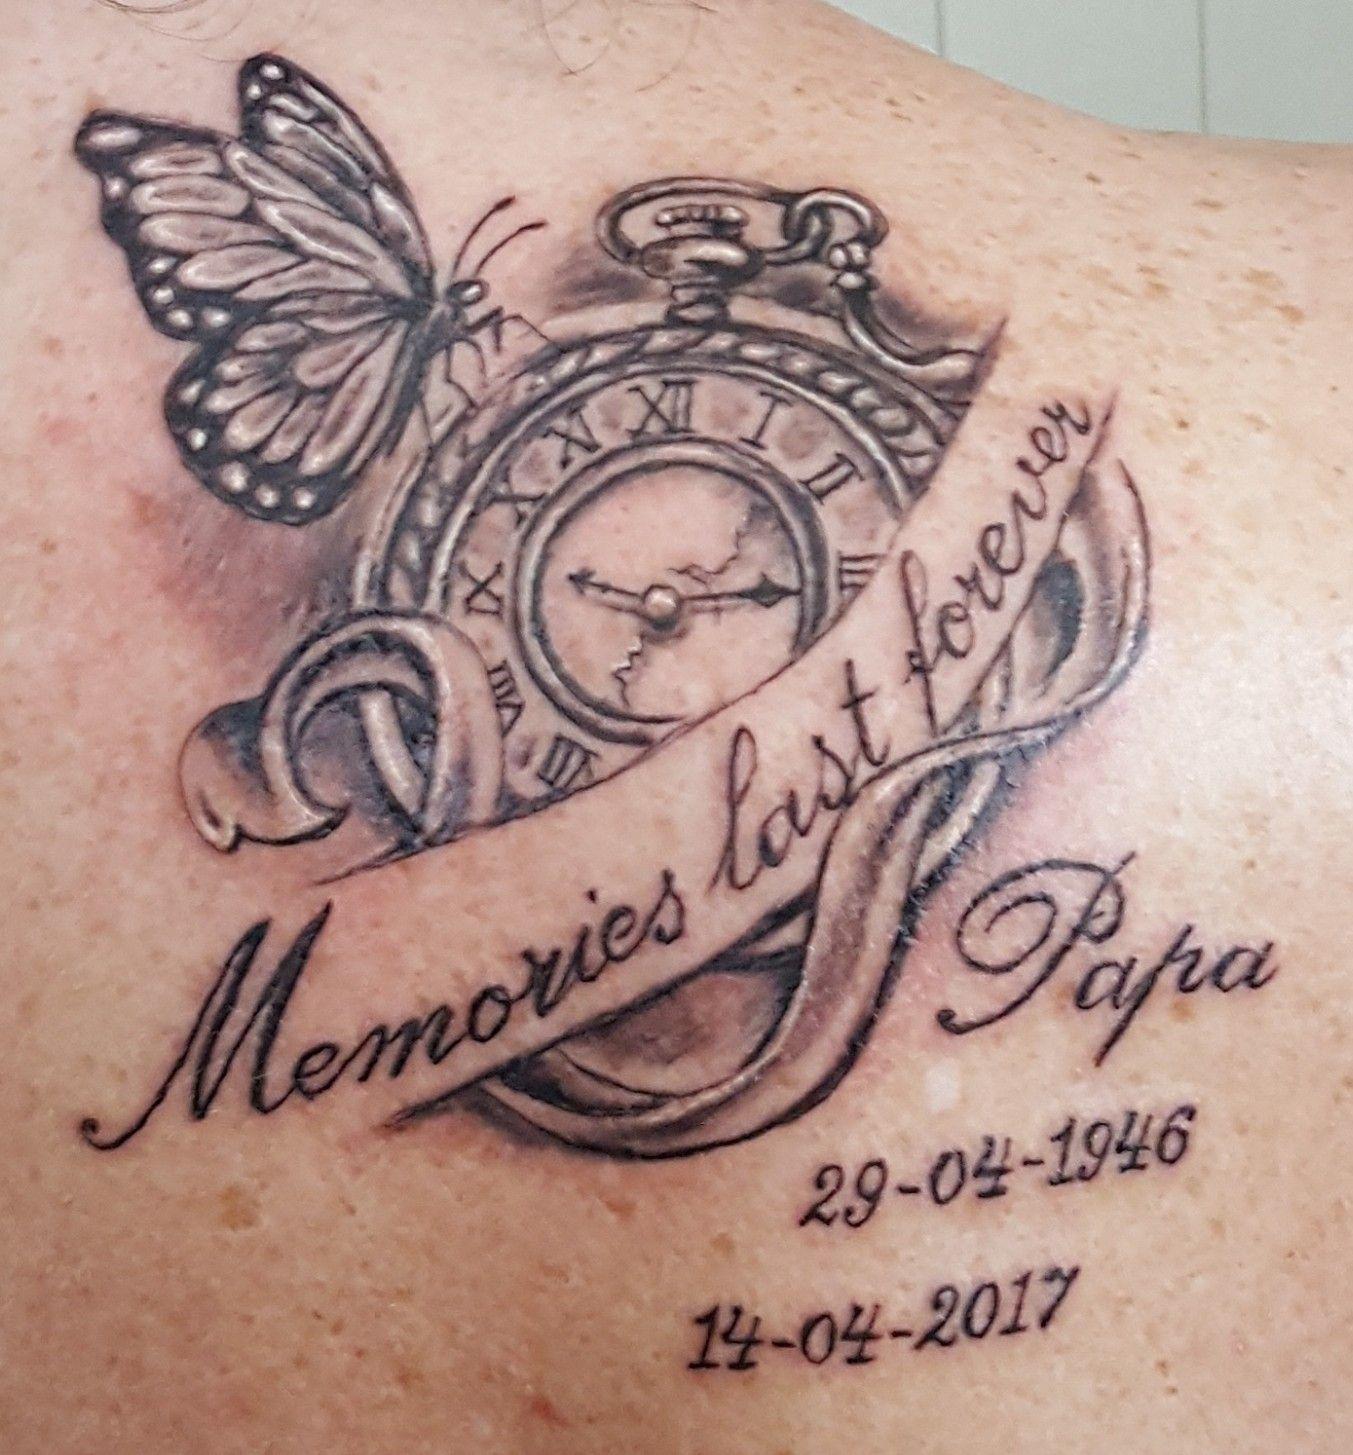 Tattoo Memories Last Forever Missing Dad Tattoo Dad